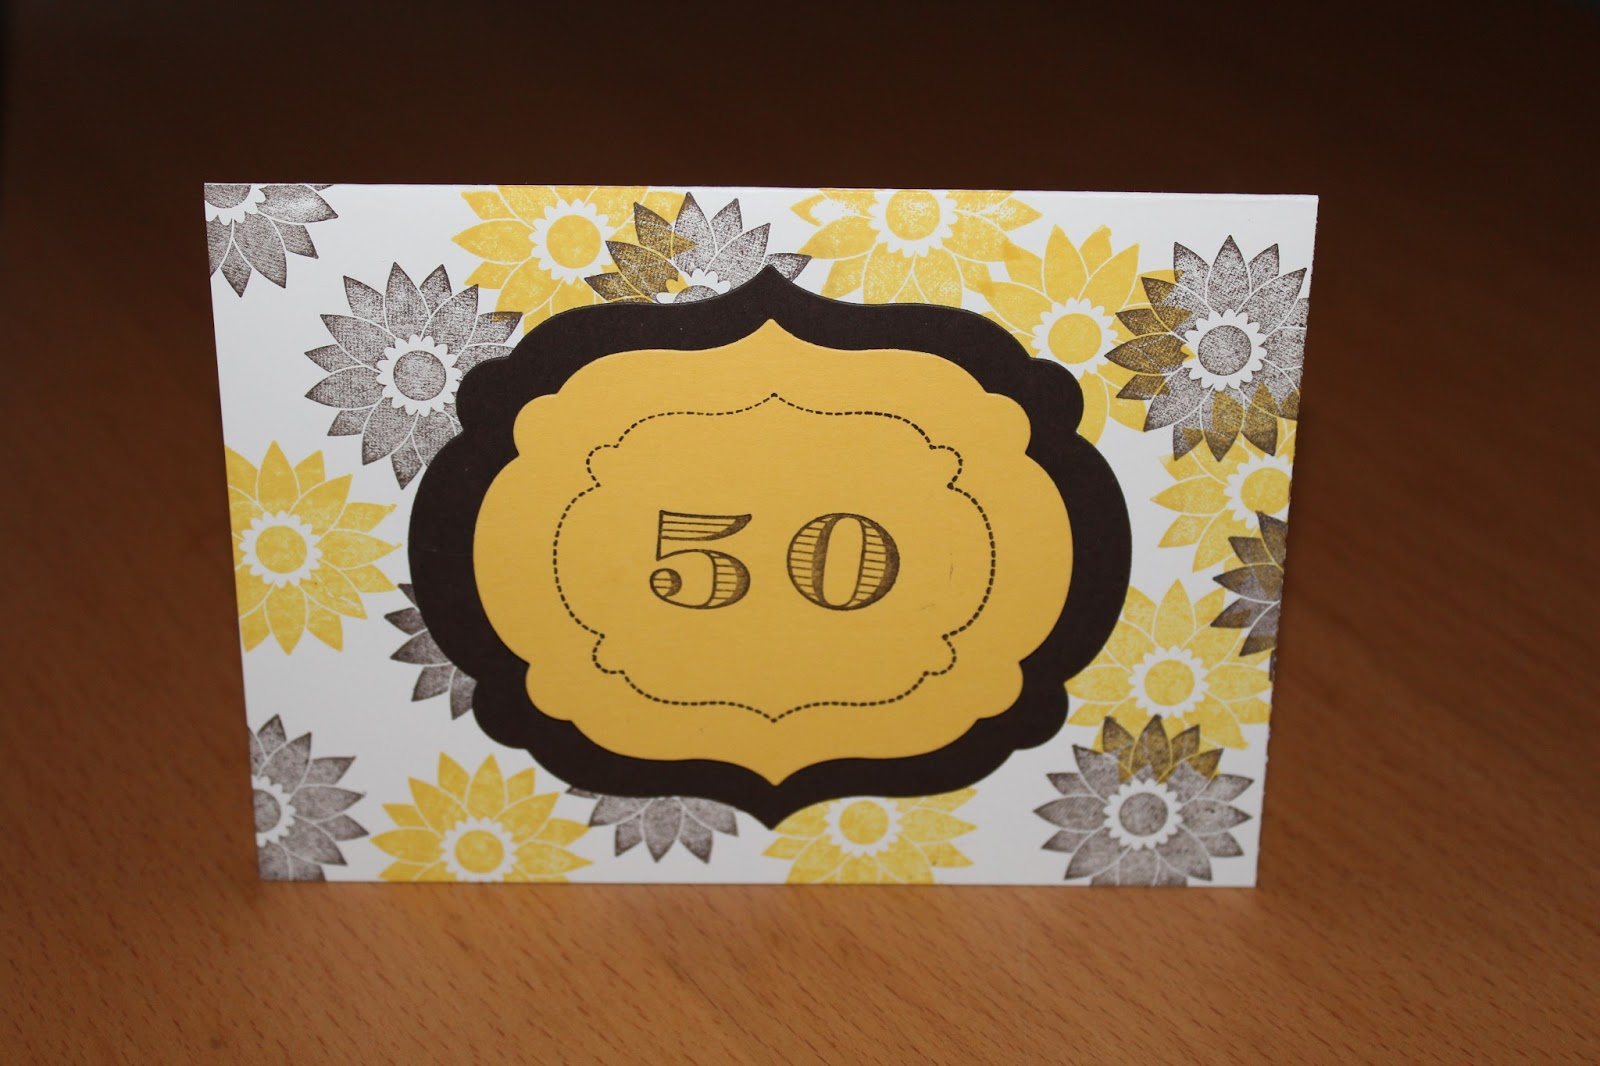 geschenke zum 50ten geburtstag